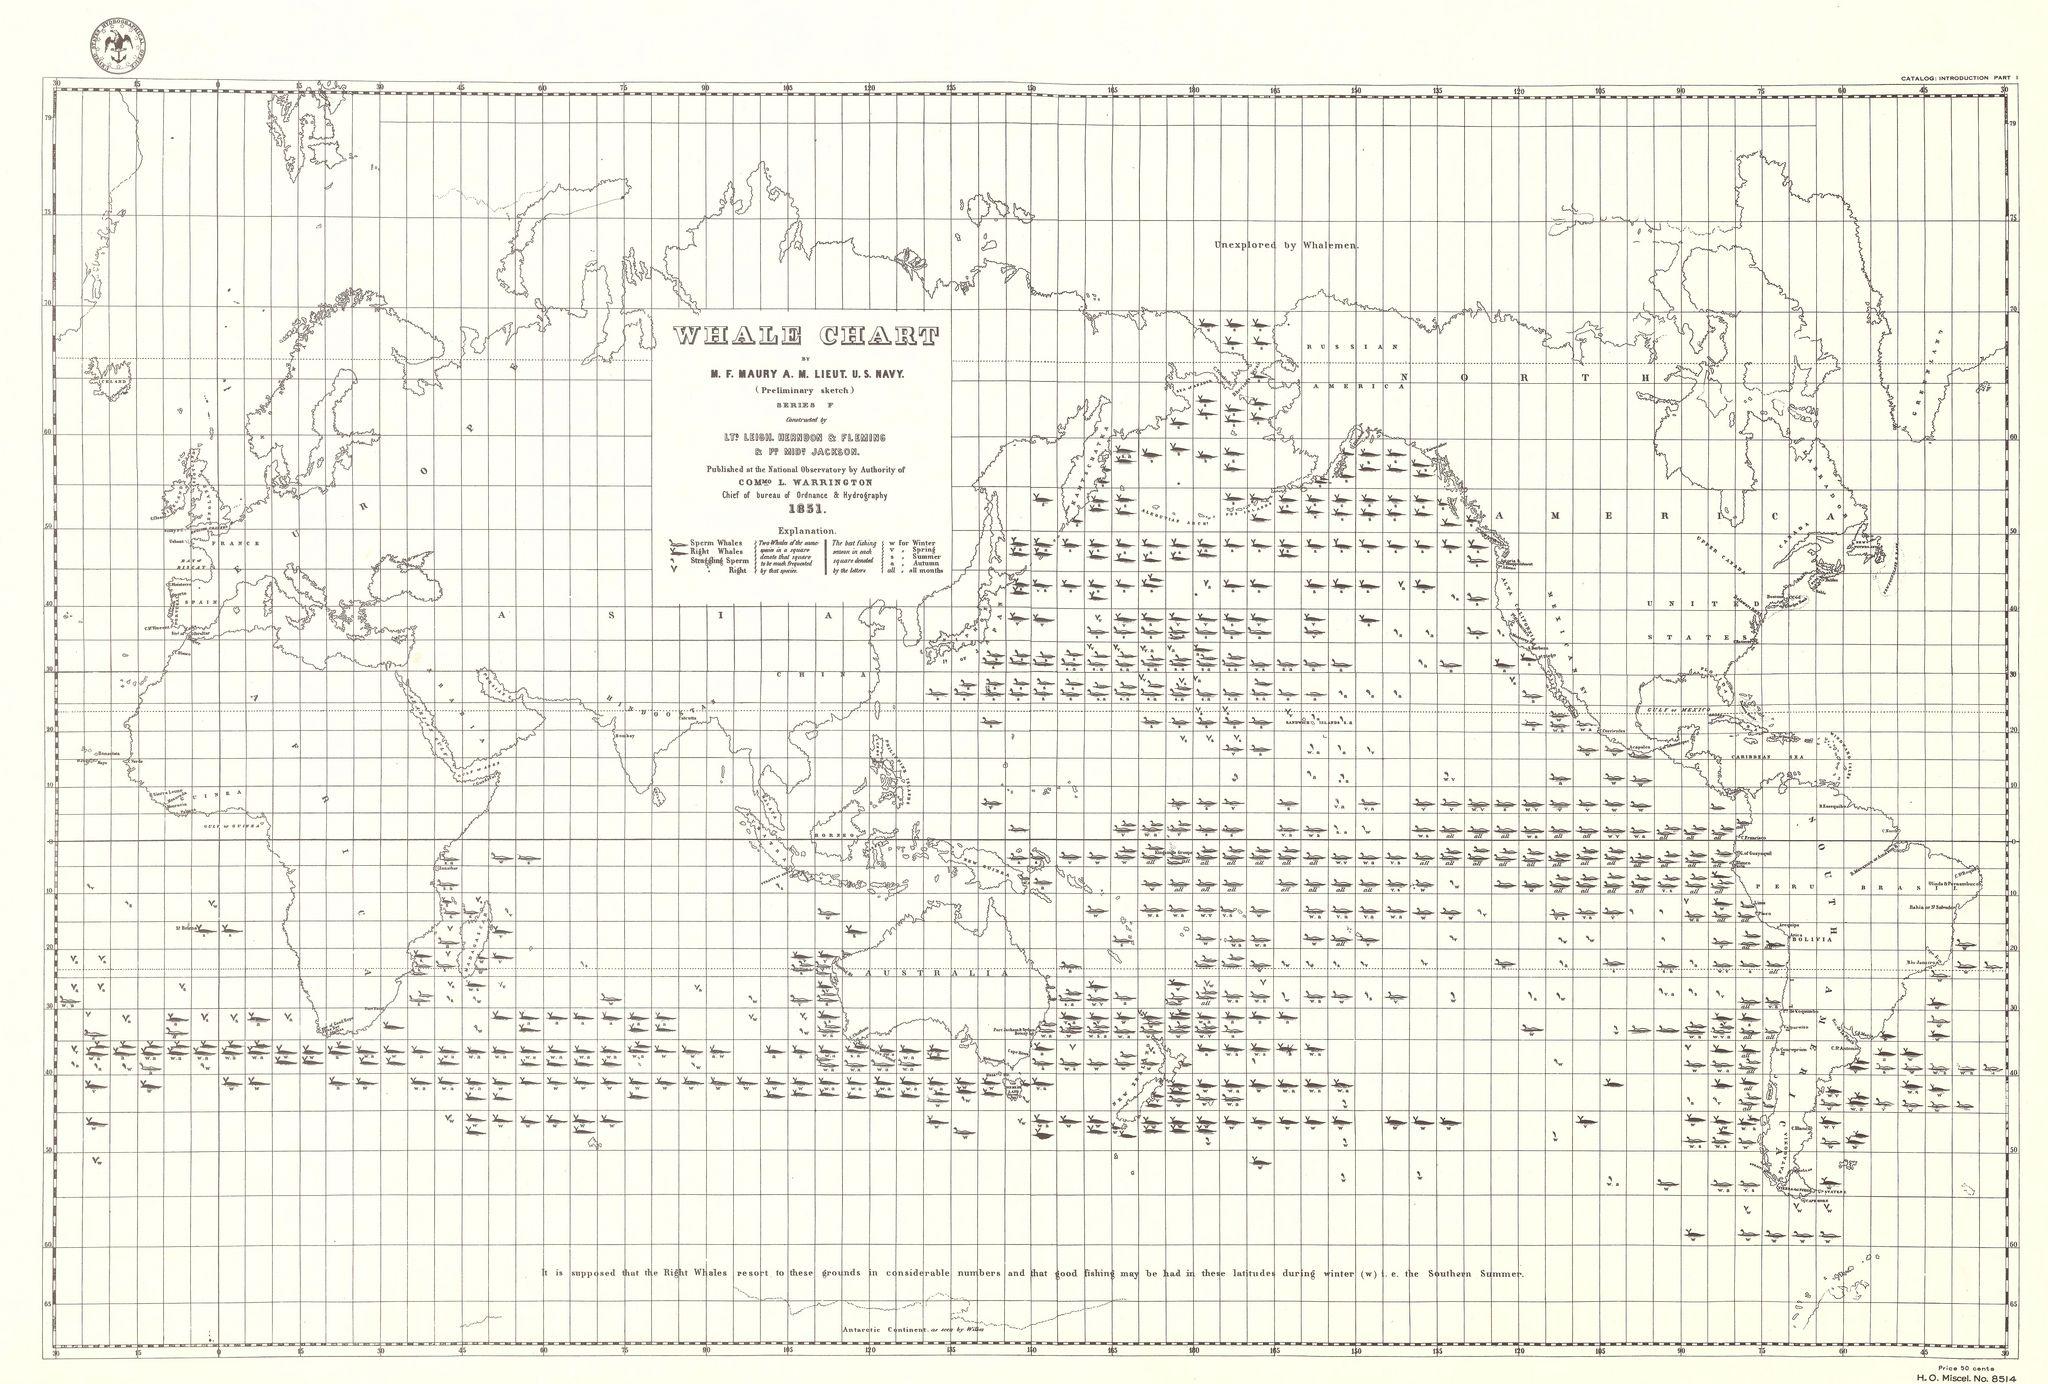 Whale chart.  Matthew Fontaine Maury, 1851